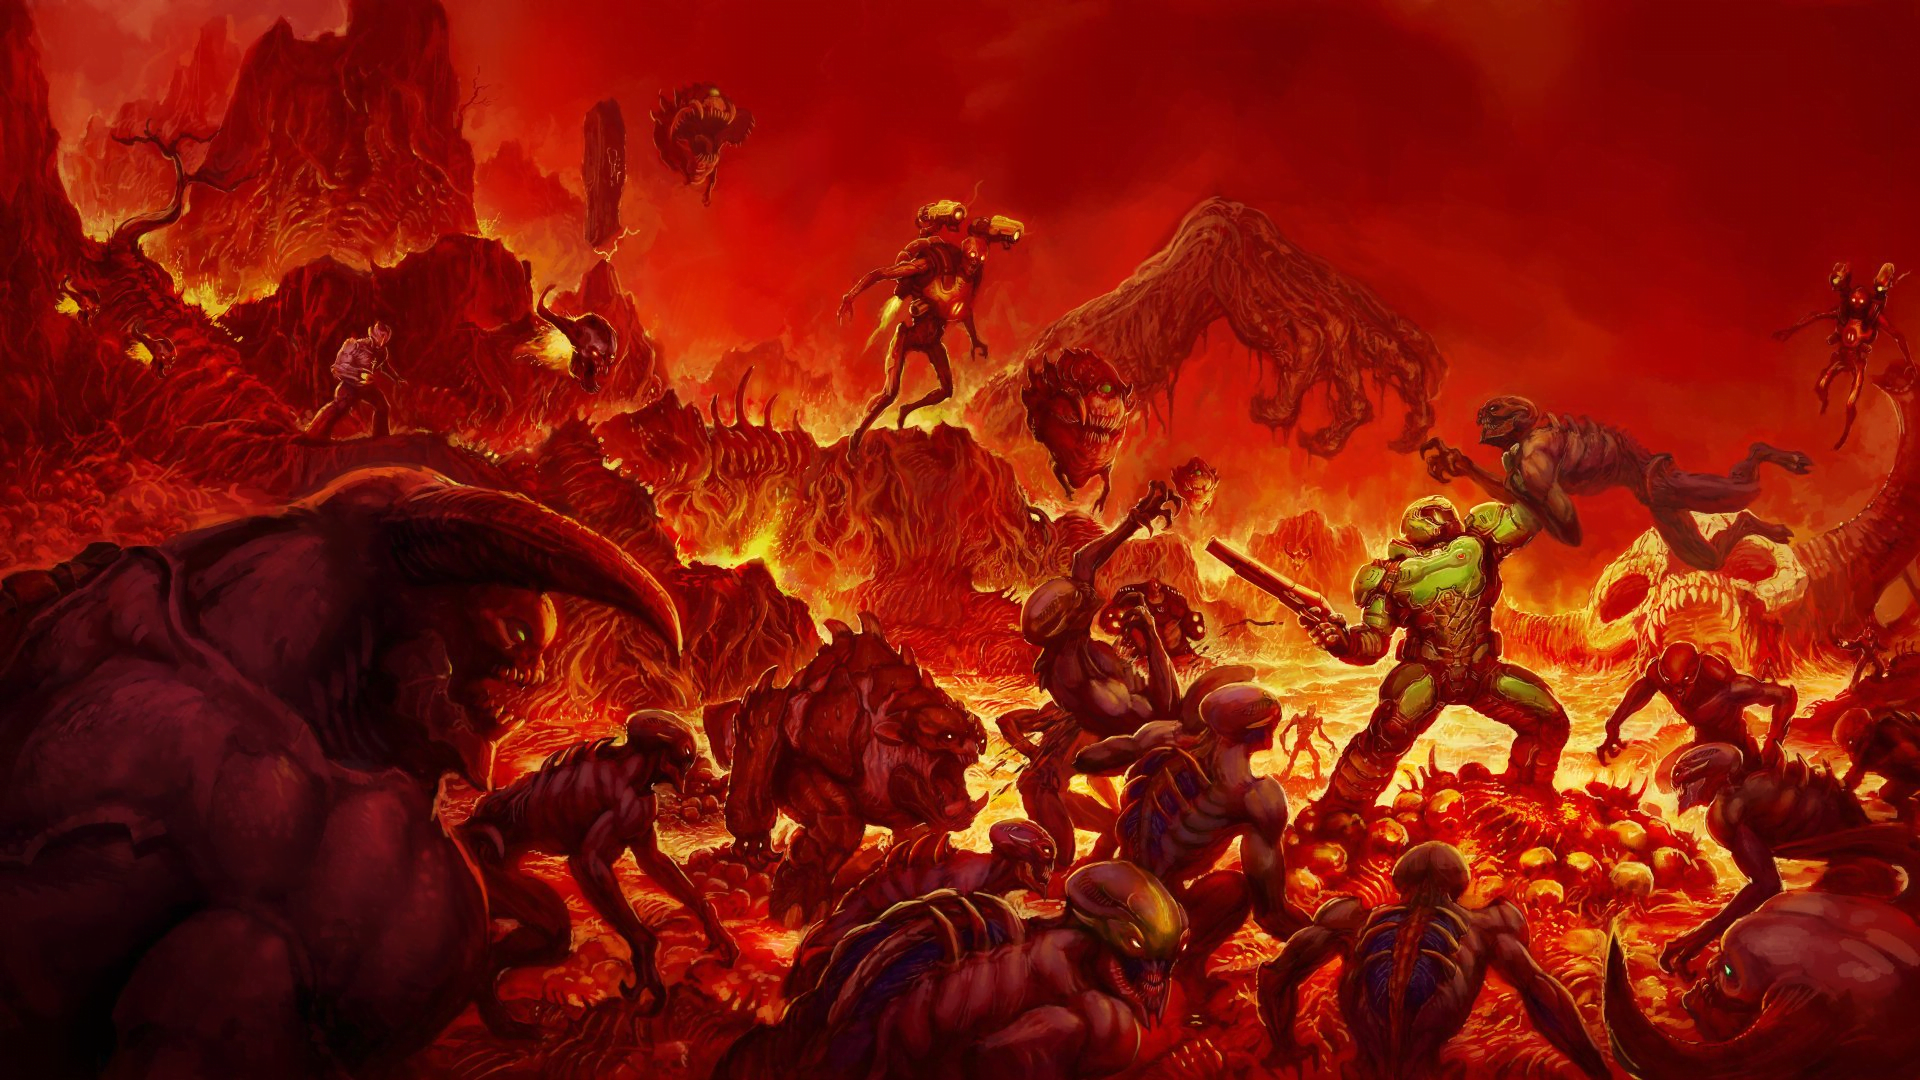 Protagonista Dooma: Doom Slayer